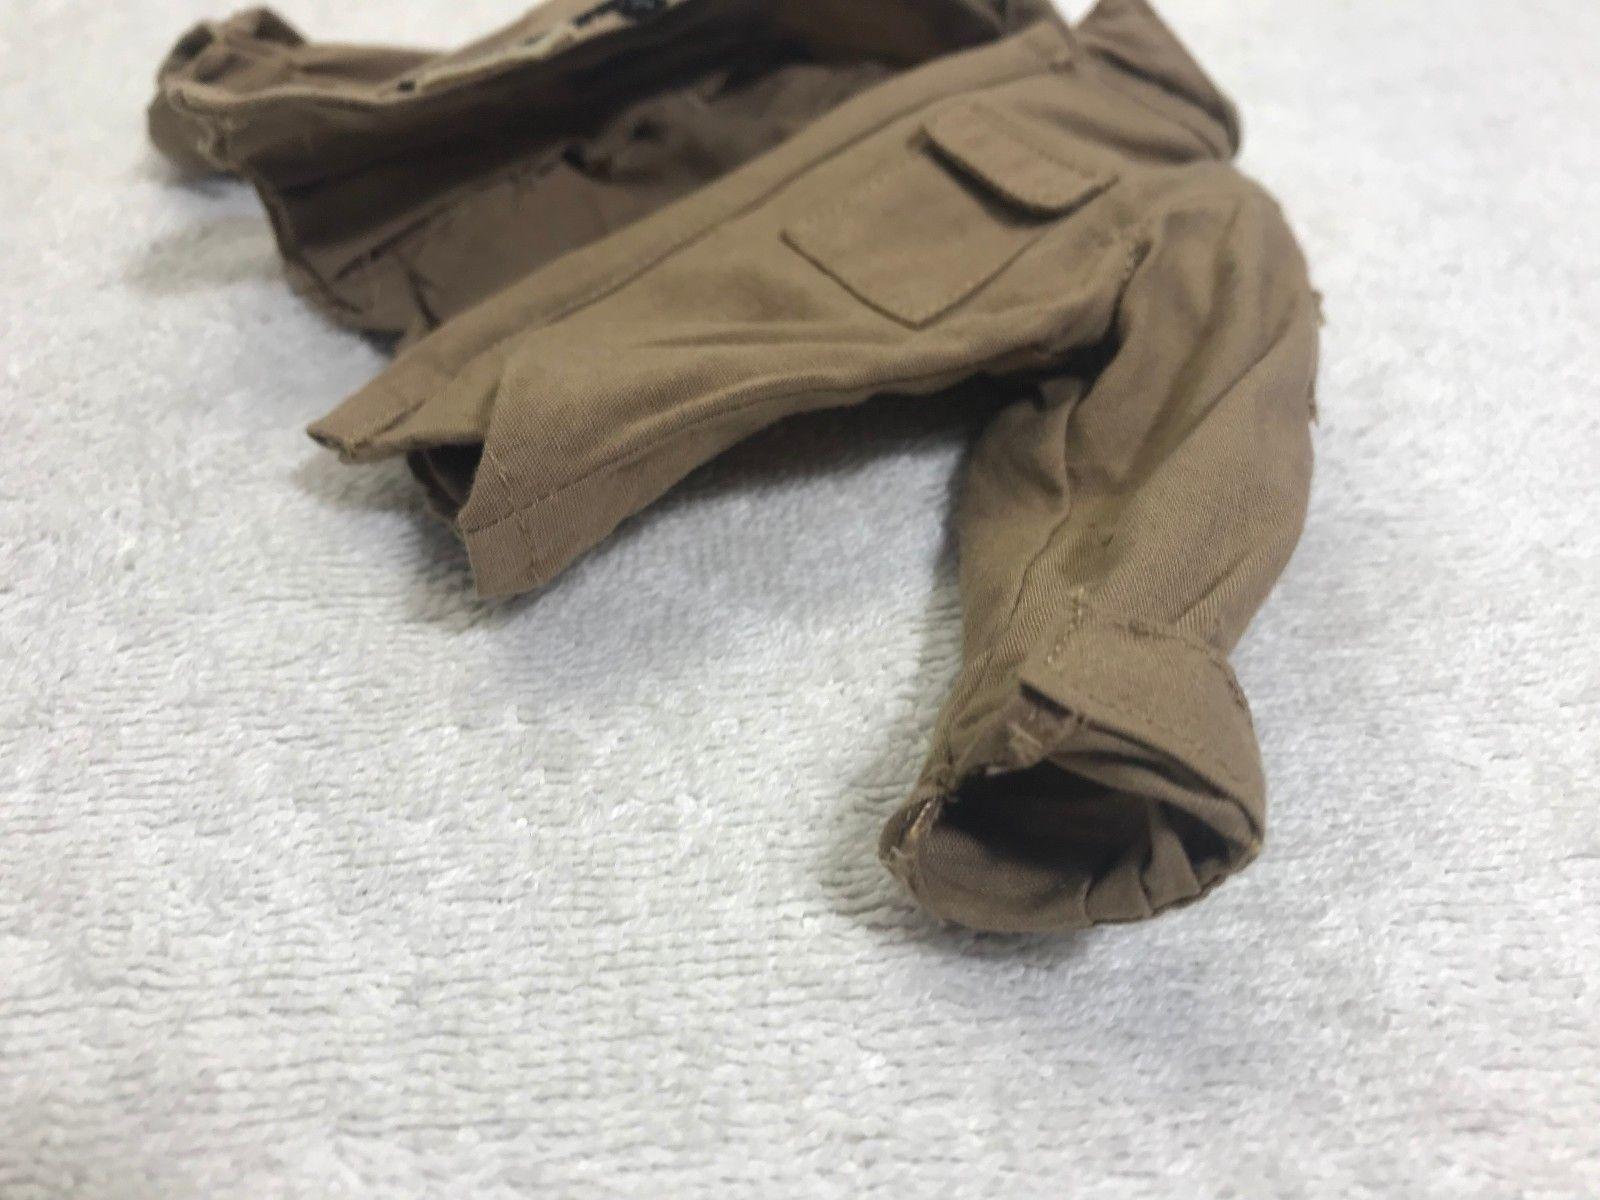 Predator Major Alan 'Dutch' Tan Jacket 1/6th Scale MMS 72 - Hot Toys